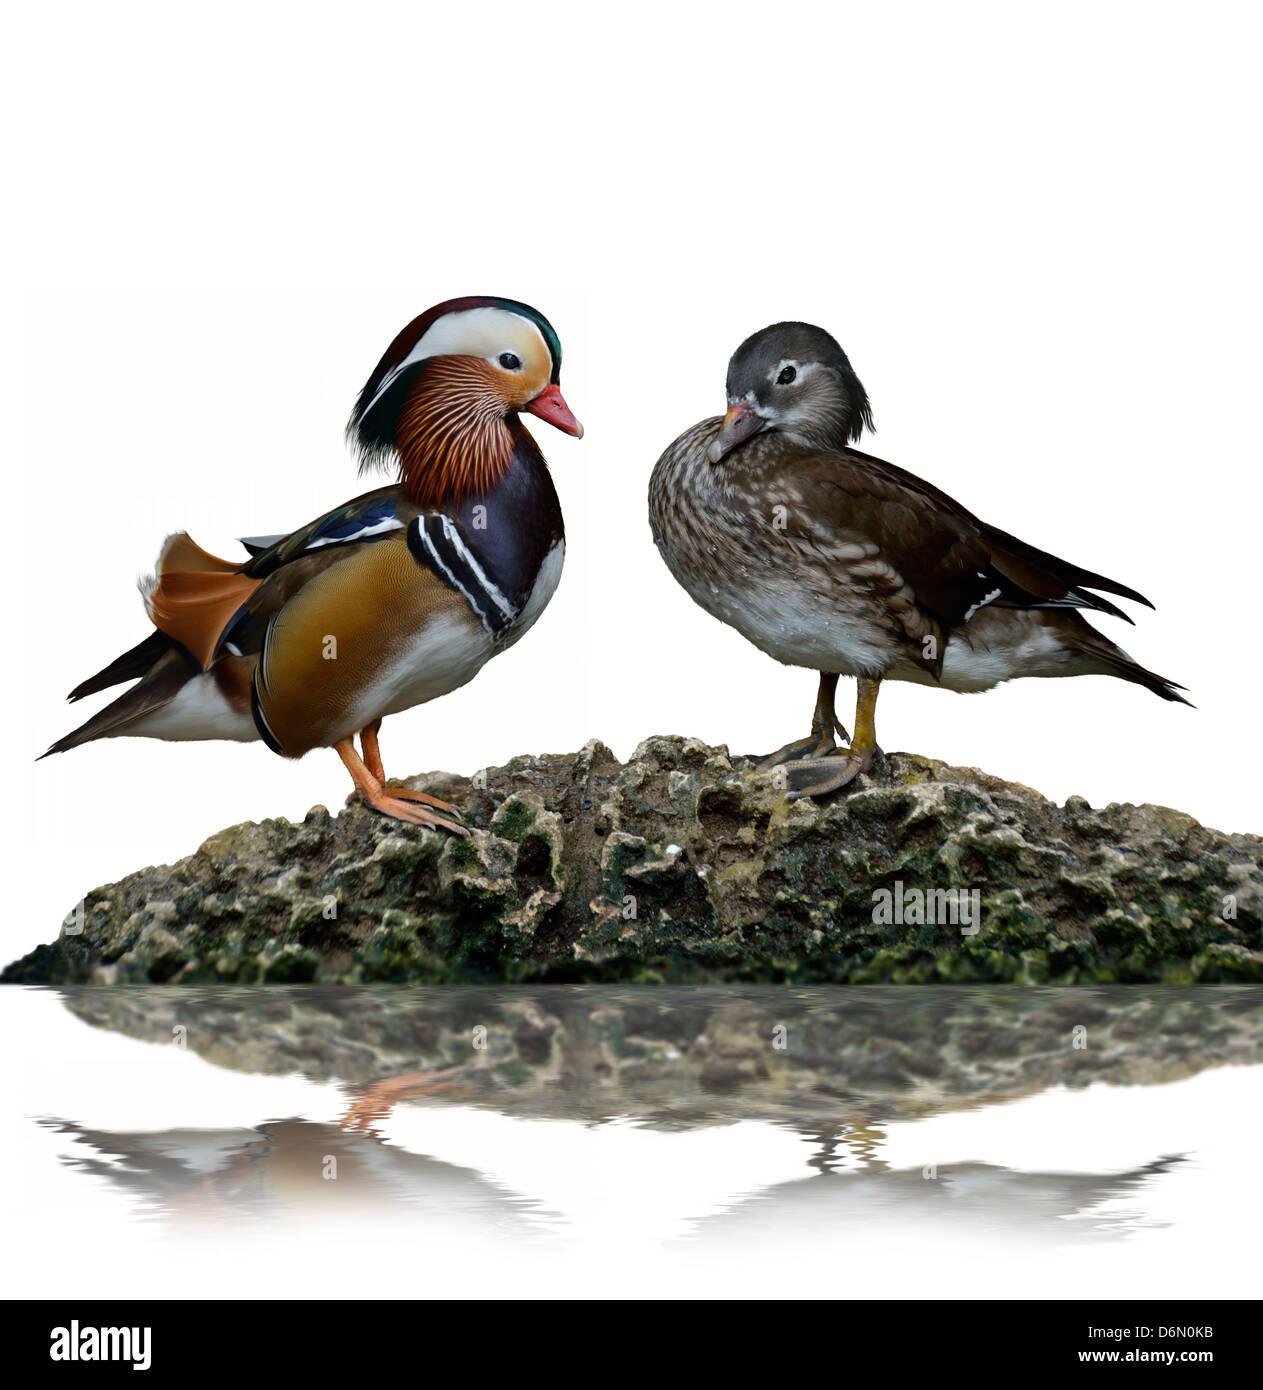 Male And Female Mandarin Ducks (Aix Galericulata) - Stock Image